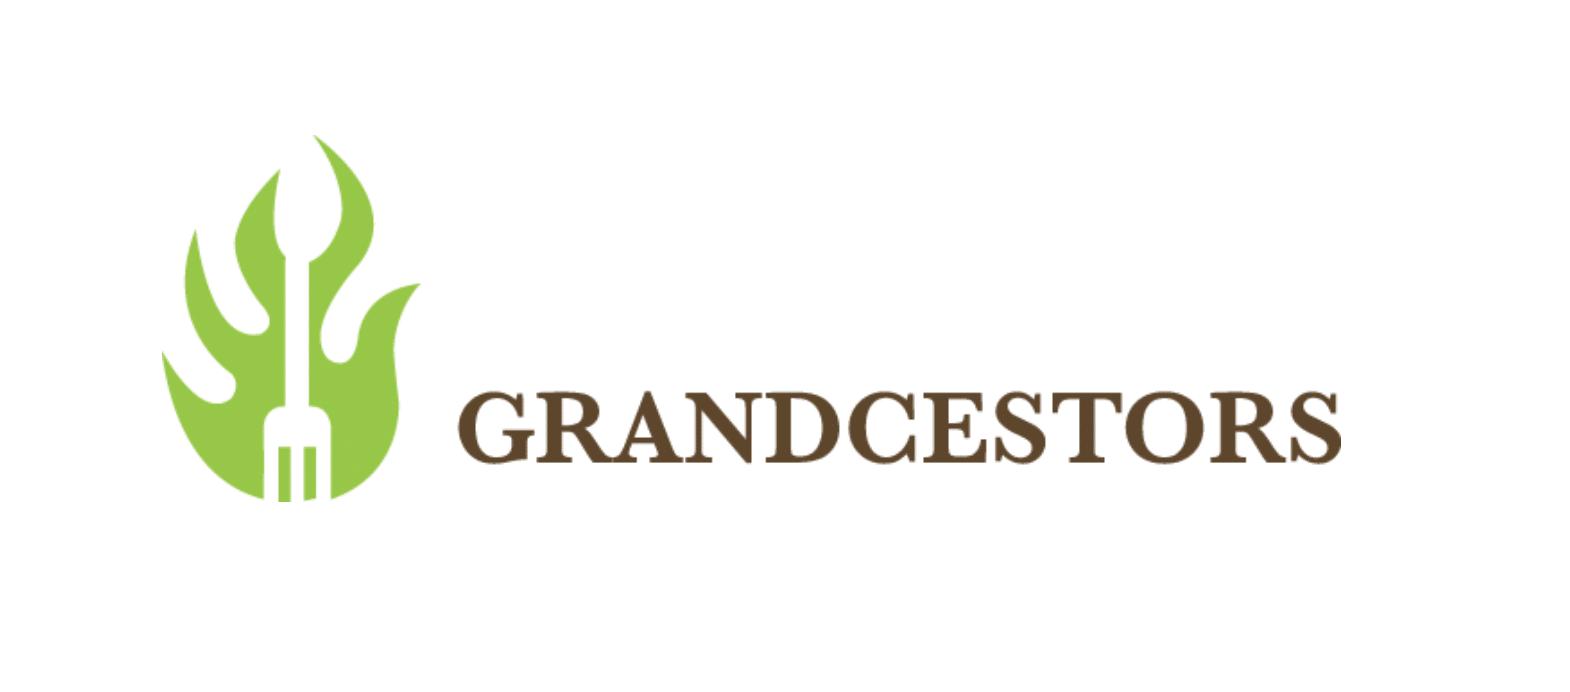 Grandcestors logo